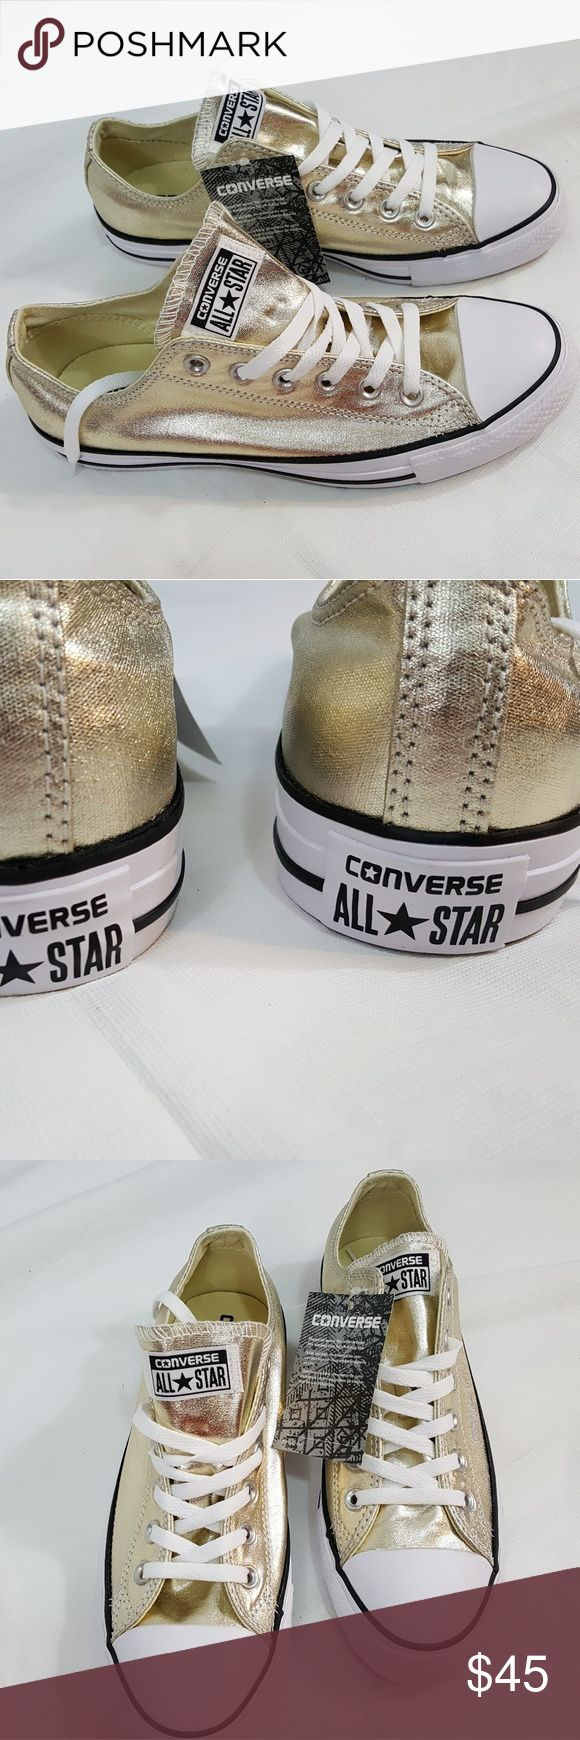 Converse All Star  Metallic Gold Unisex Sneaker Men's size 7  Women's  size 9  Top box open.  NEW   Non smoking environment Converse Shoes Sneakers